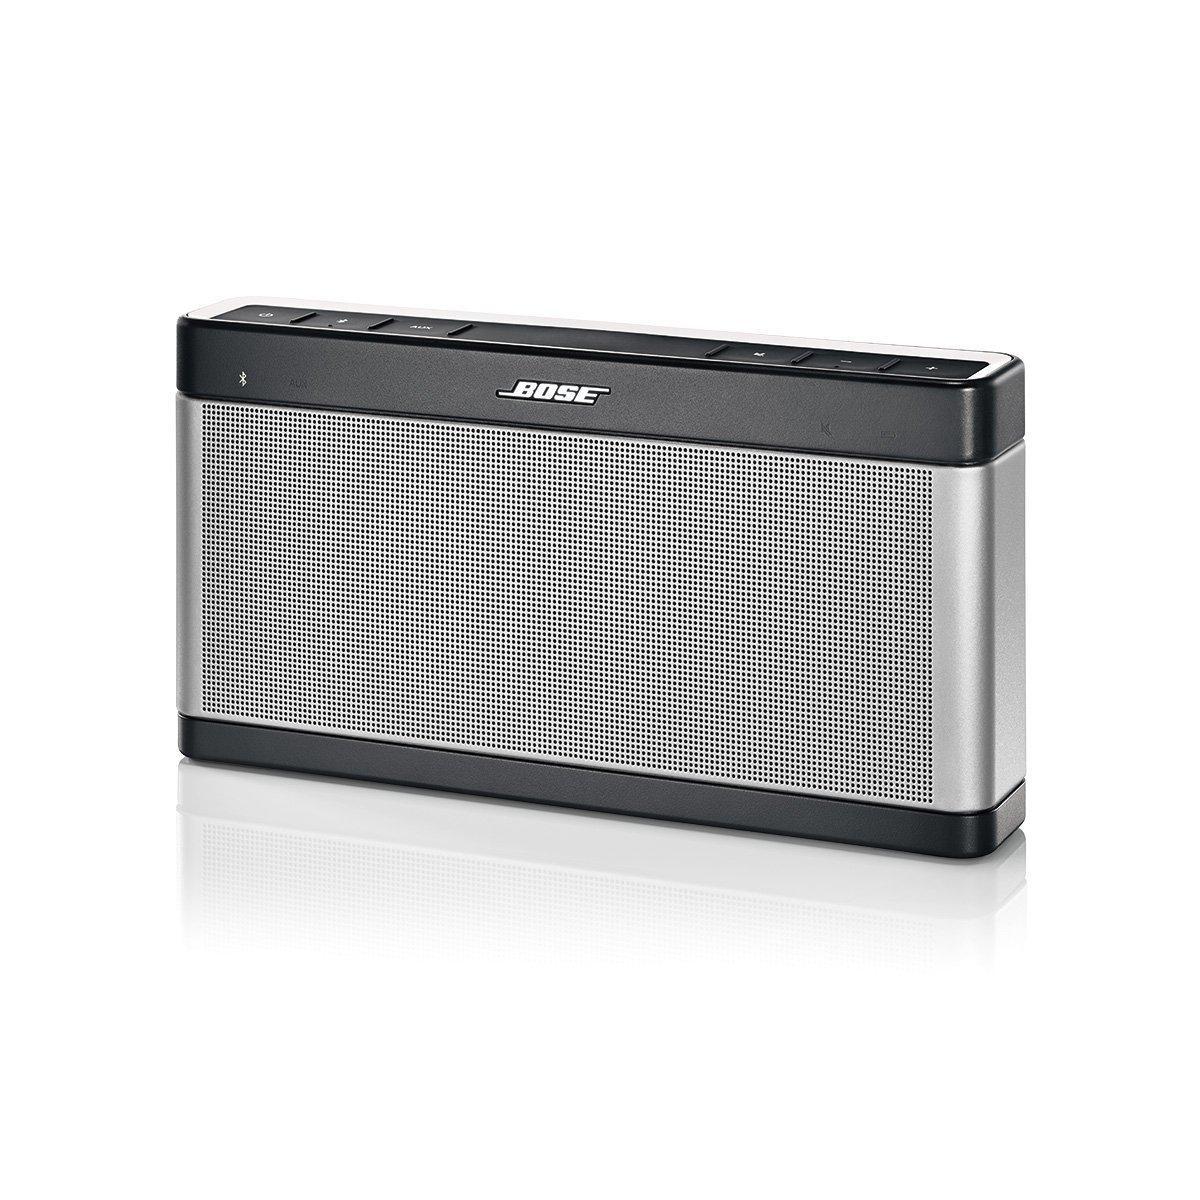 Enceinte Bluetooth Bose SoundLink III - Gris